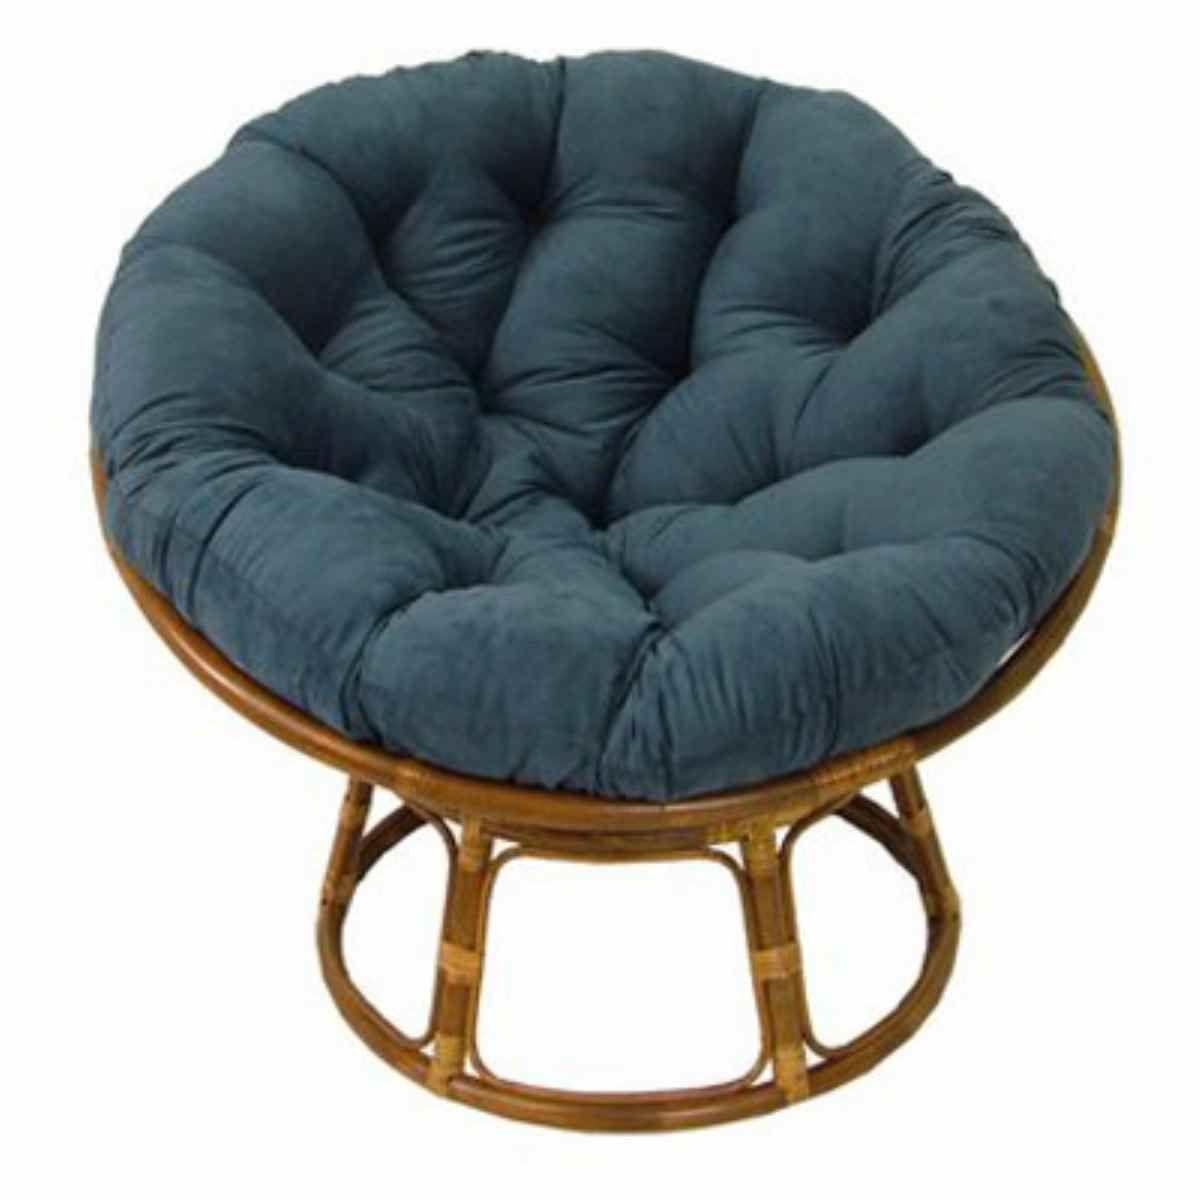 Antique Wicker Chair Cushions   Unique Furniture Ideas   Intriguing ...